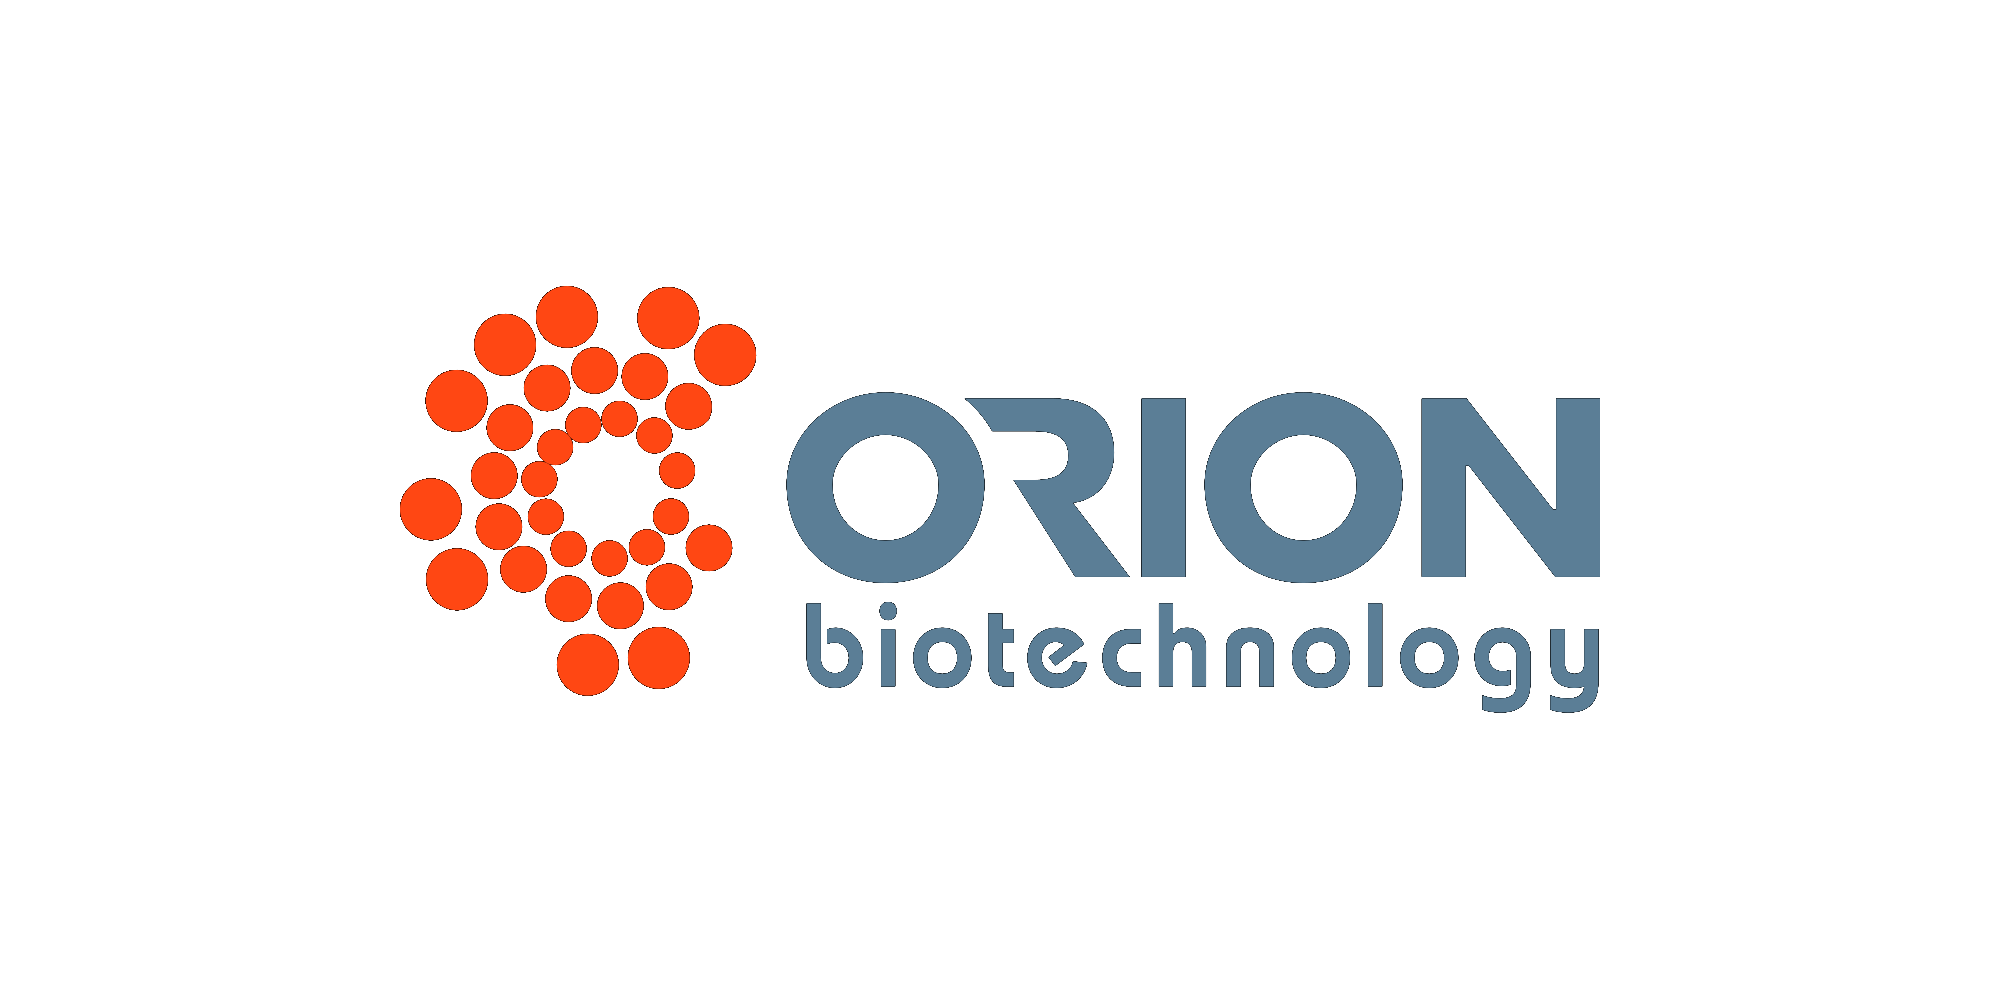 Orion Biotech